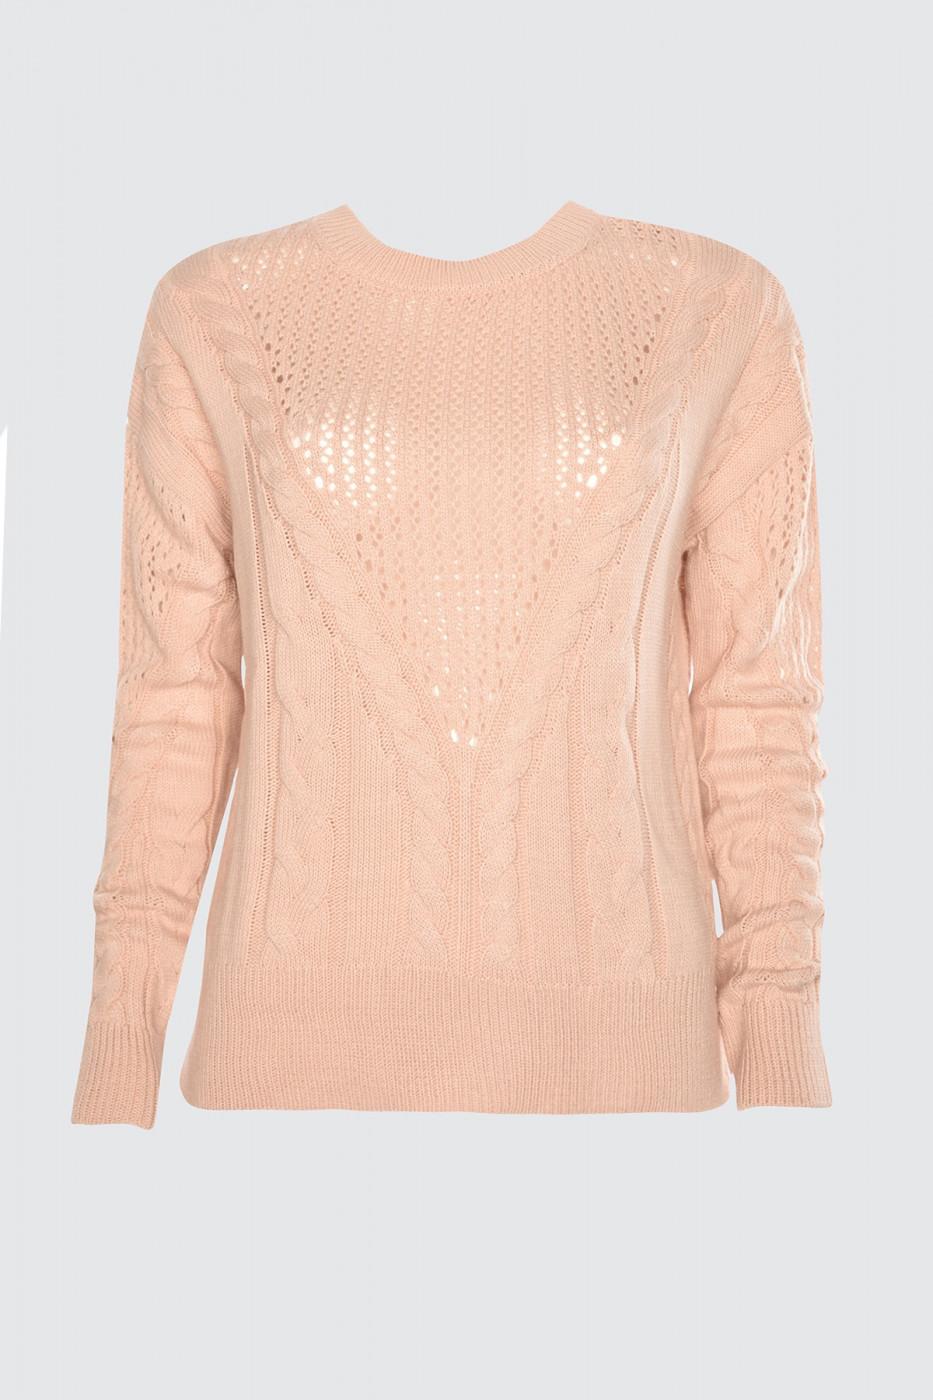 Trendyol Powder Edifying Knitted Detailed KnitWear Sweater